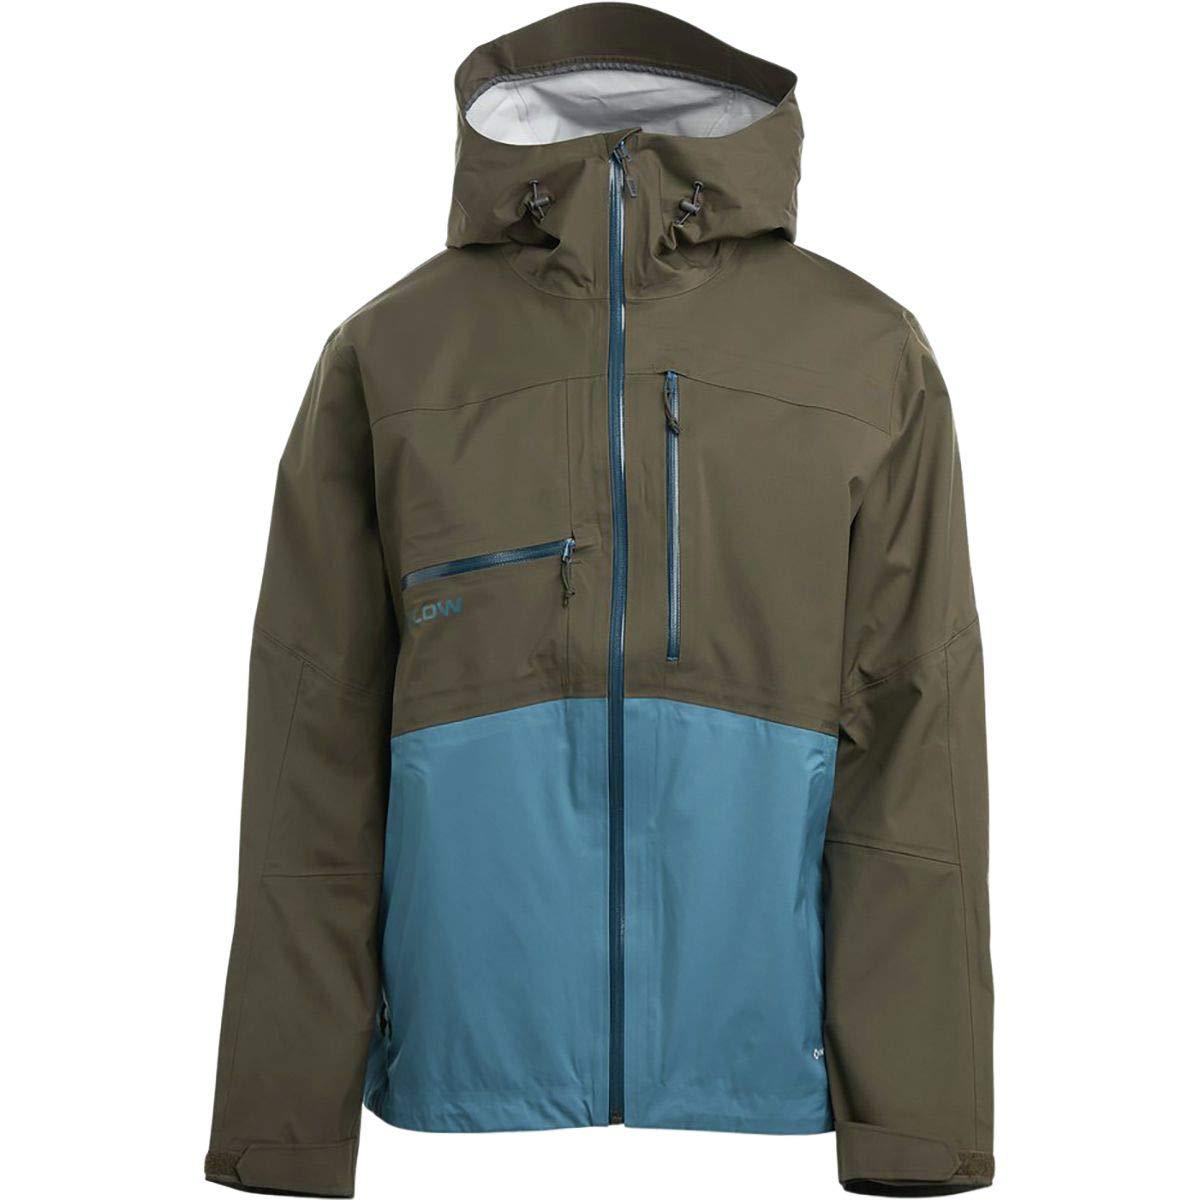 Amazon.com : Flylow Cooper Jacket - Mens : Sports & Outdoors